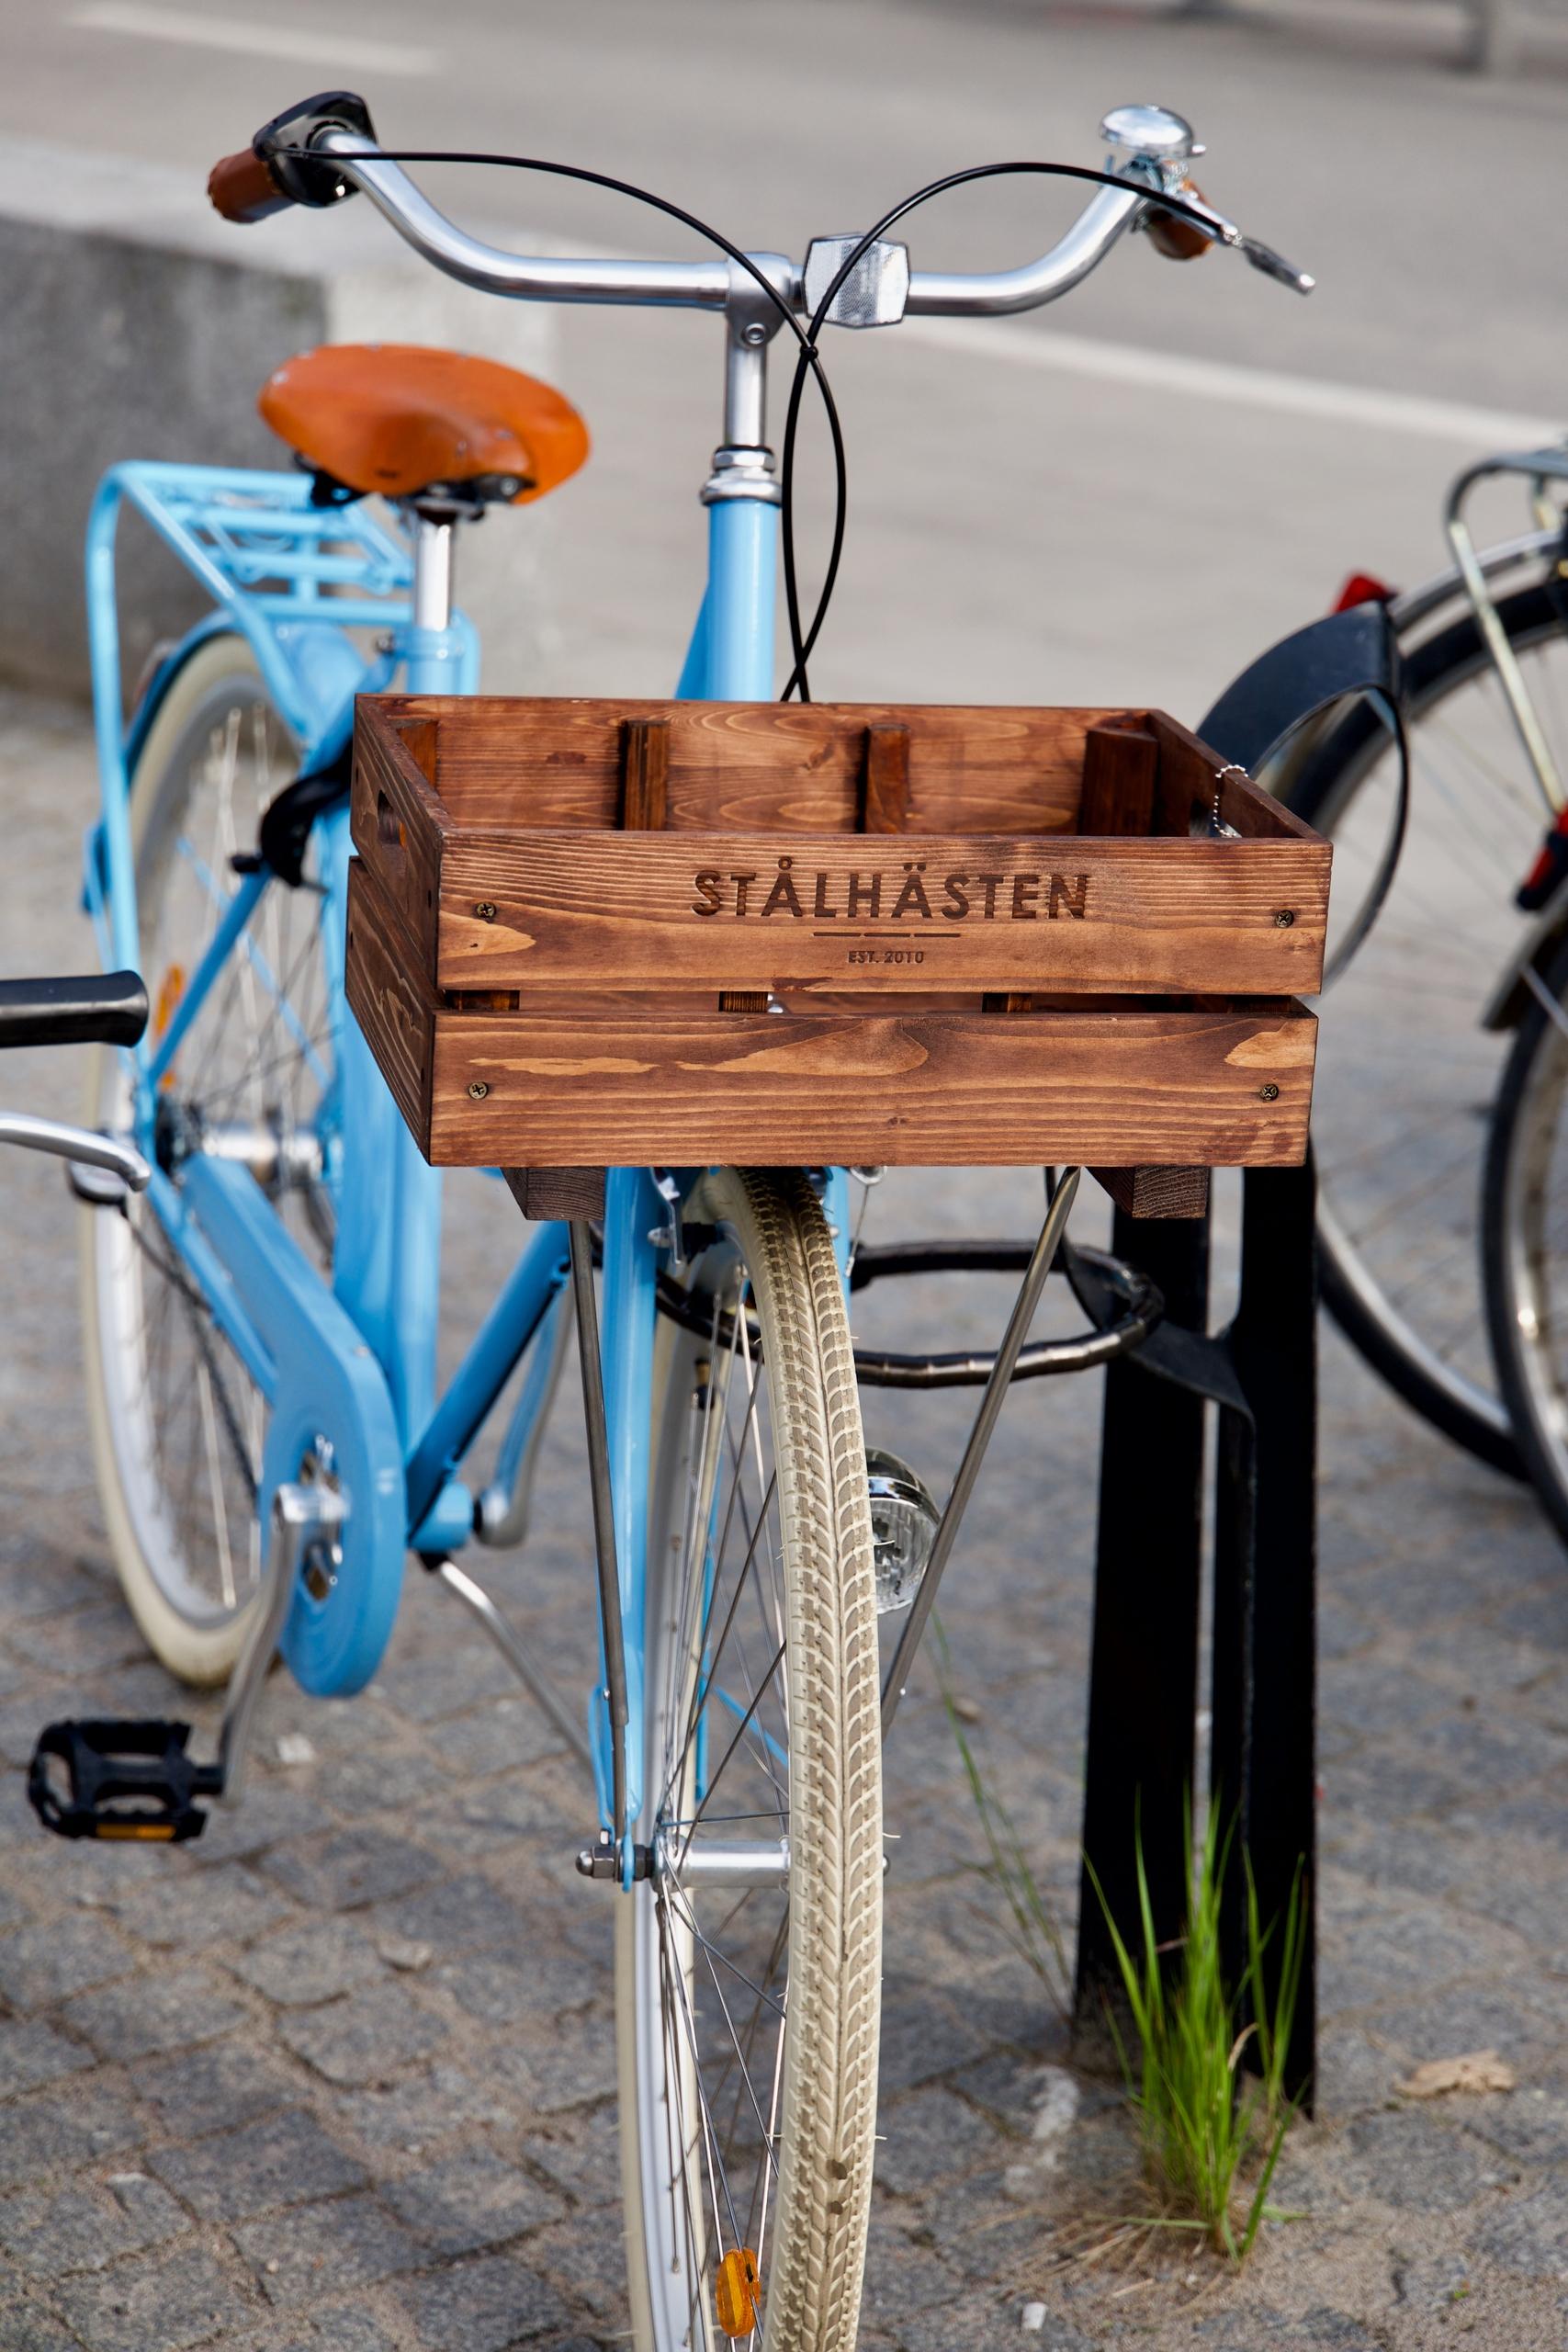 Stockholm - tolararmitt | ello